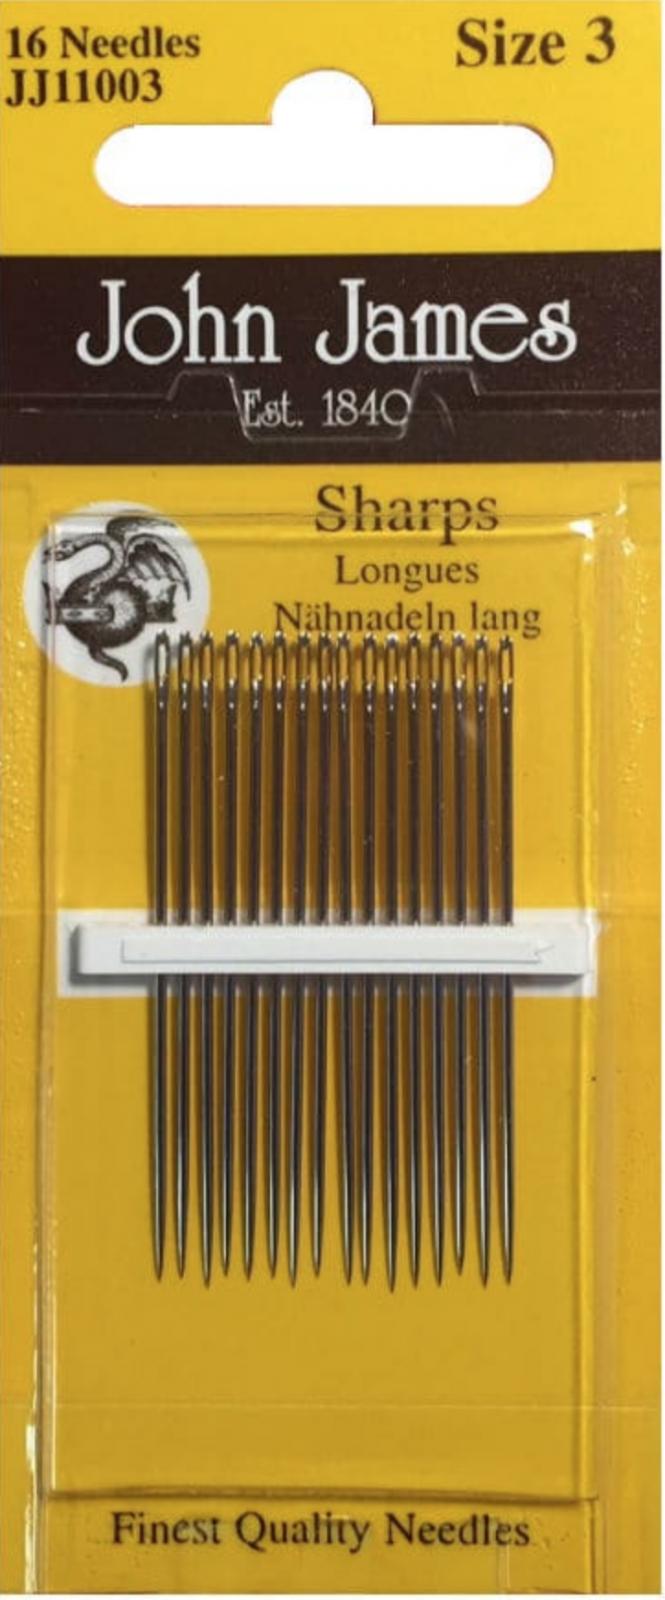 John James Sharps Needle Size 3